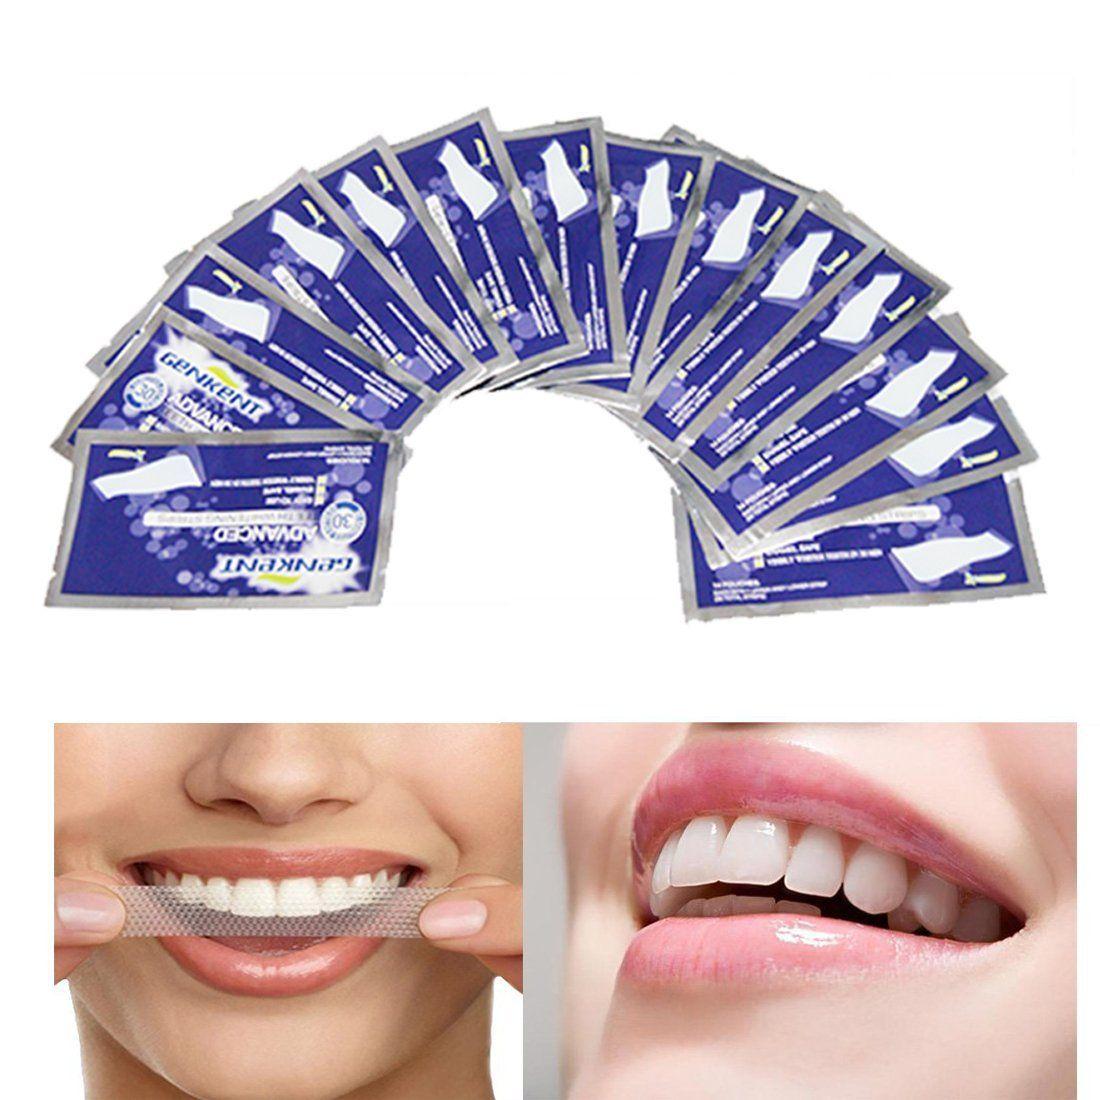 Genkent 14 Treatments Advanced Professional Teeth Whitening Gel